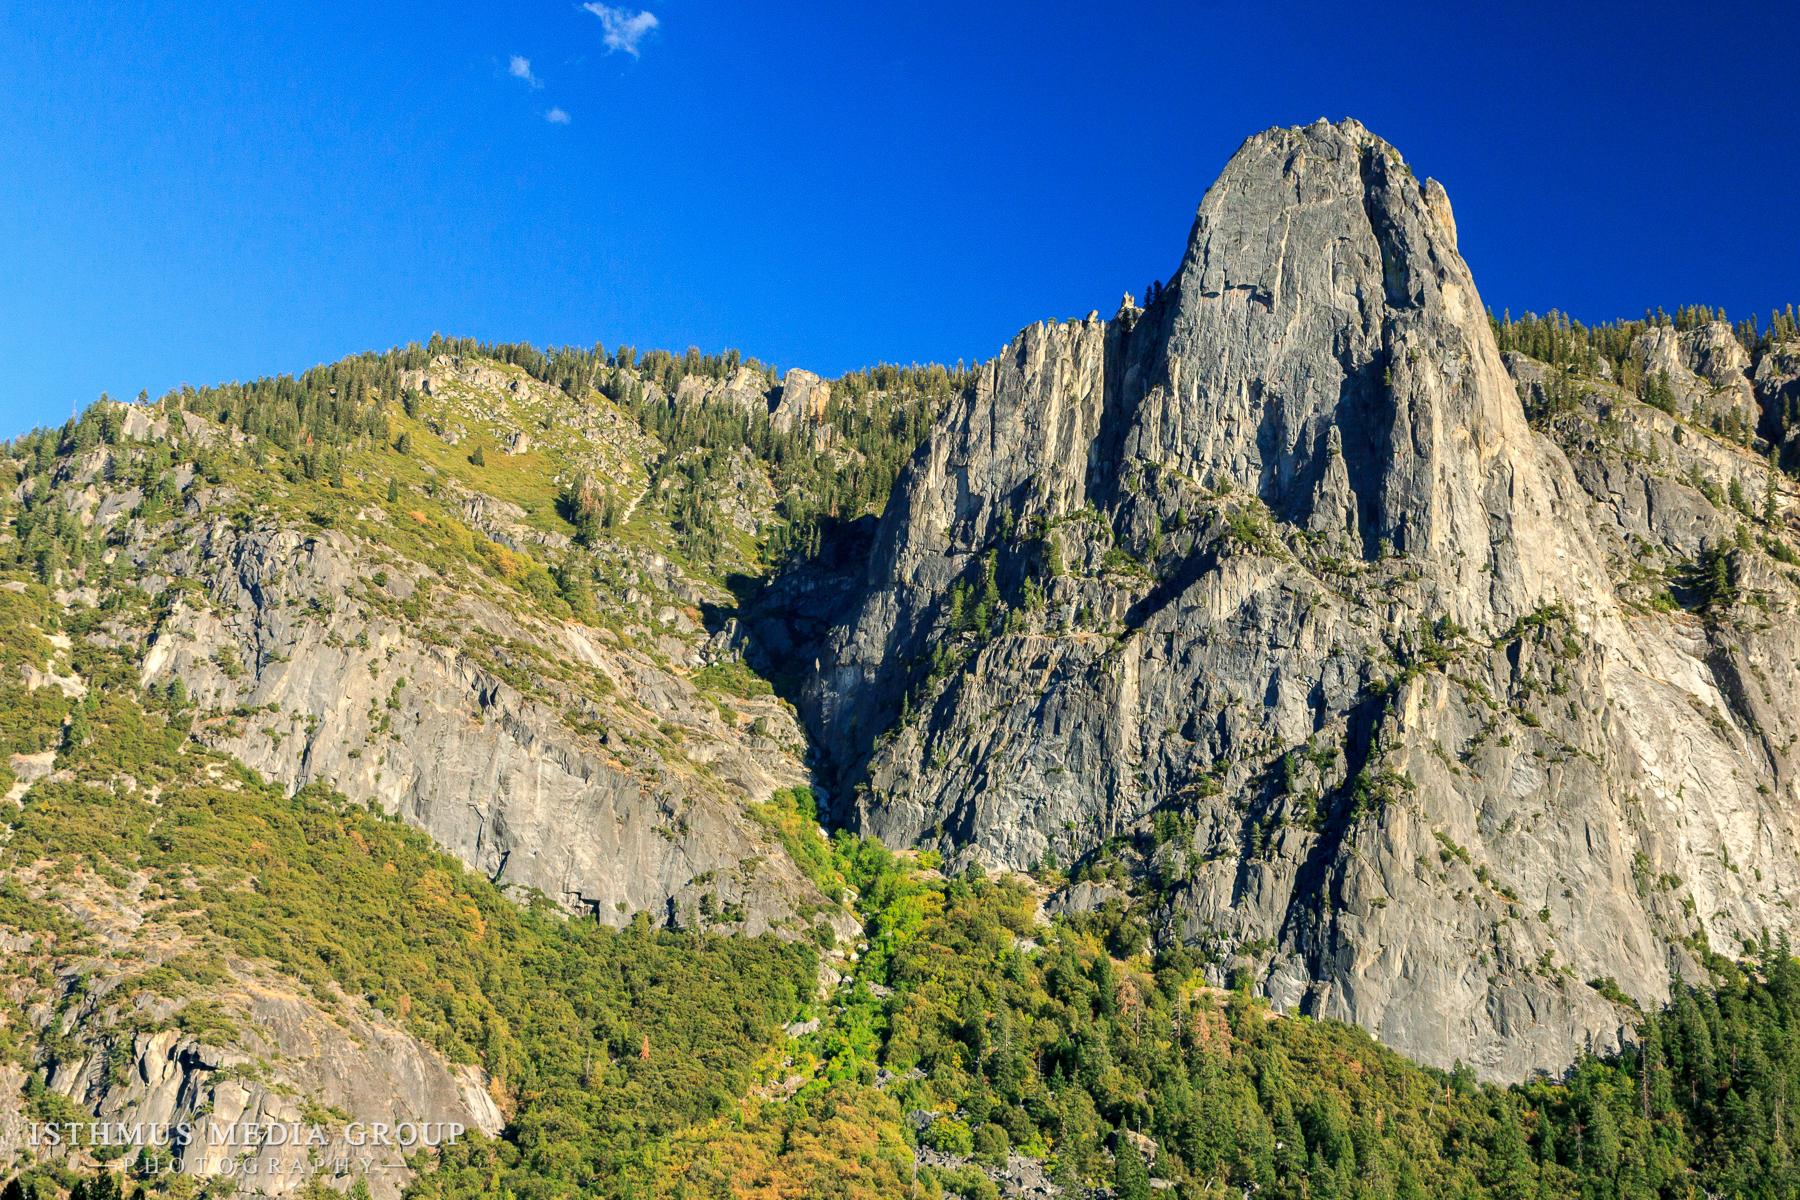 Yosemite National Park - 8983